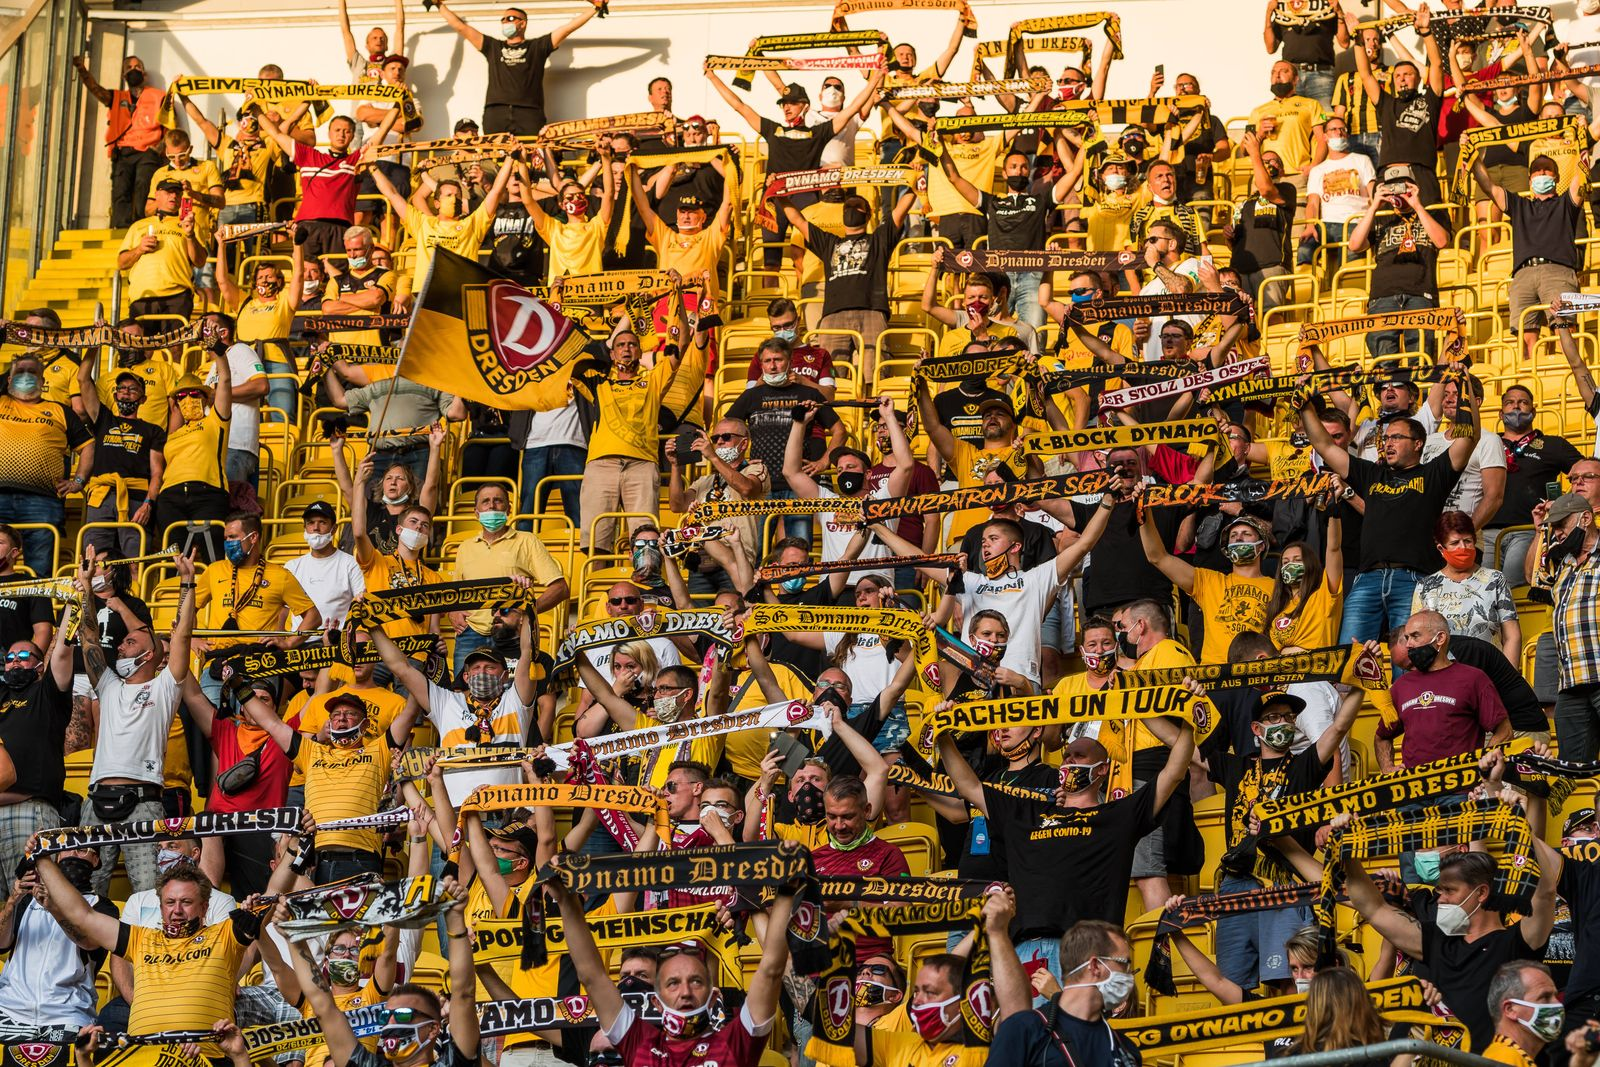 Dynamofans mit Maske; SG Dynamo Dresden - Hamburger SV; Fußball; DFB-Pokal; 1. Runde; Saison 2020/2021; Rudolf-Harbig-St